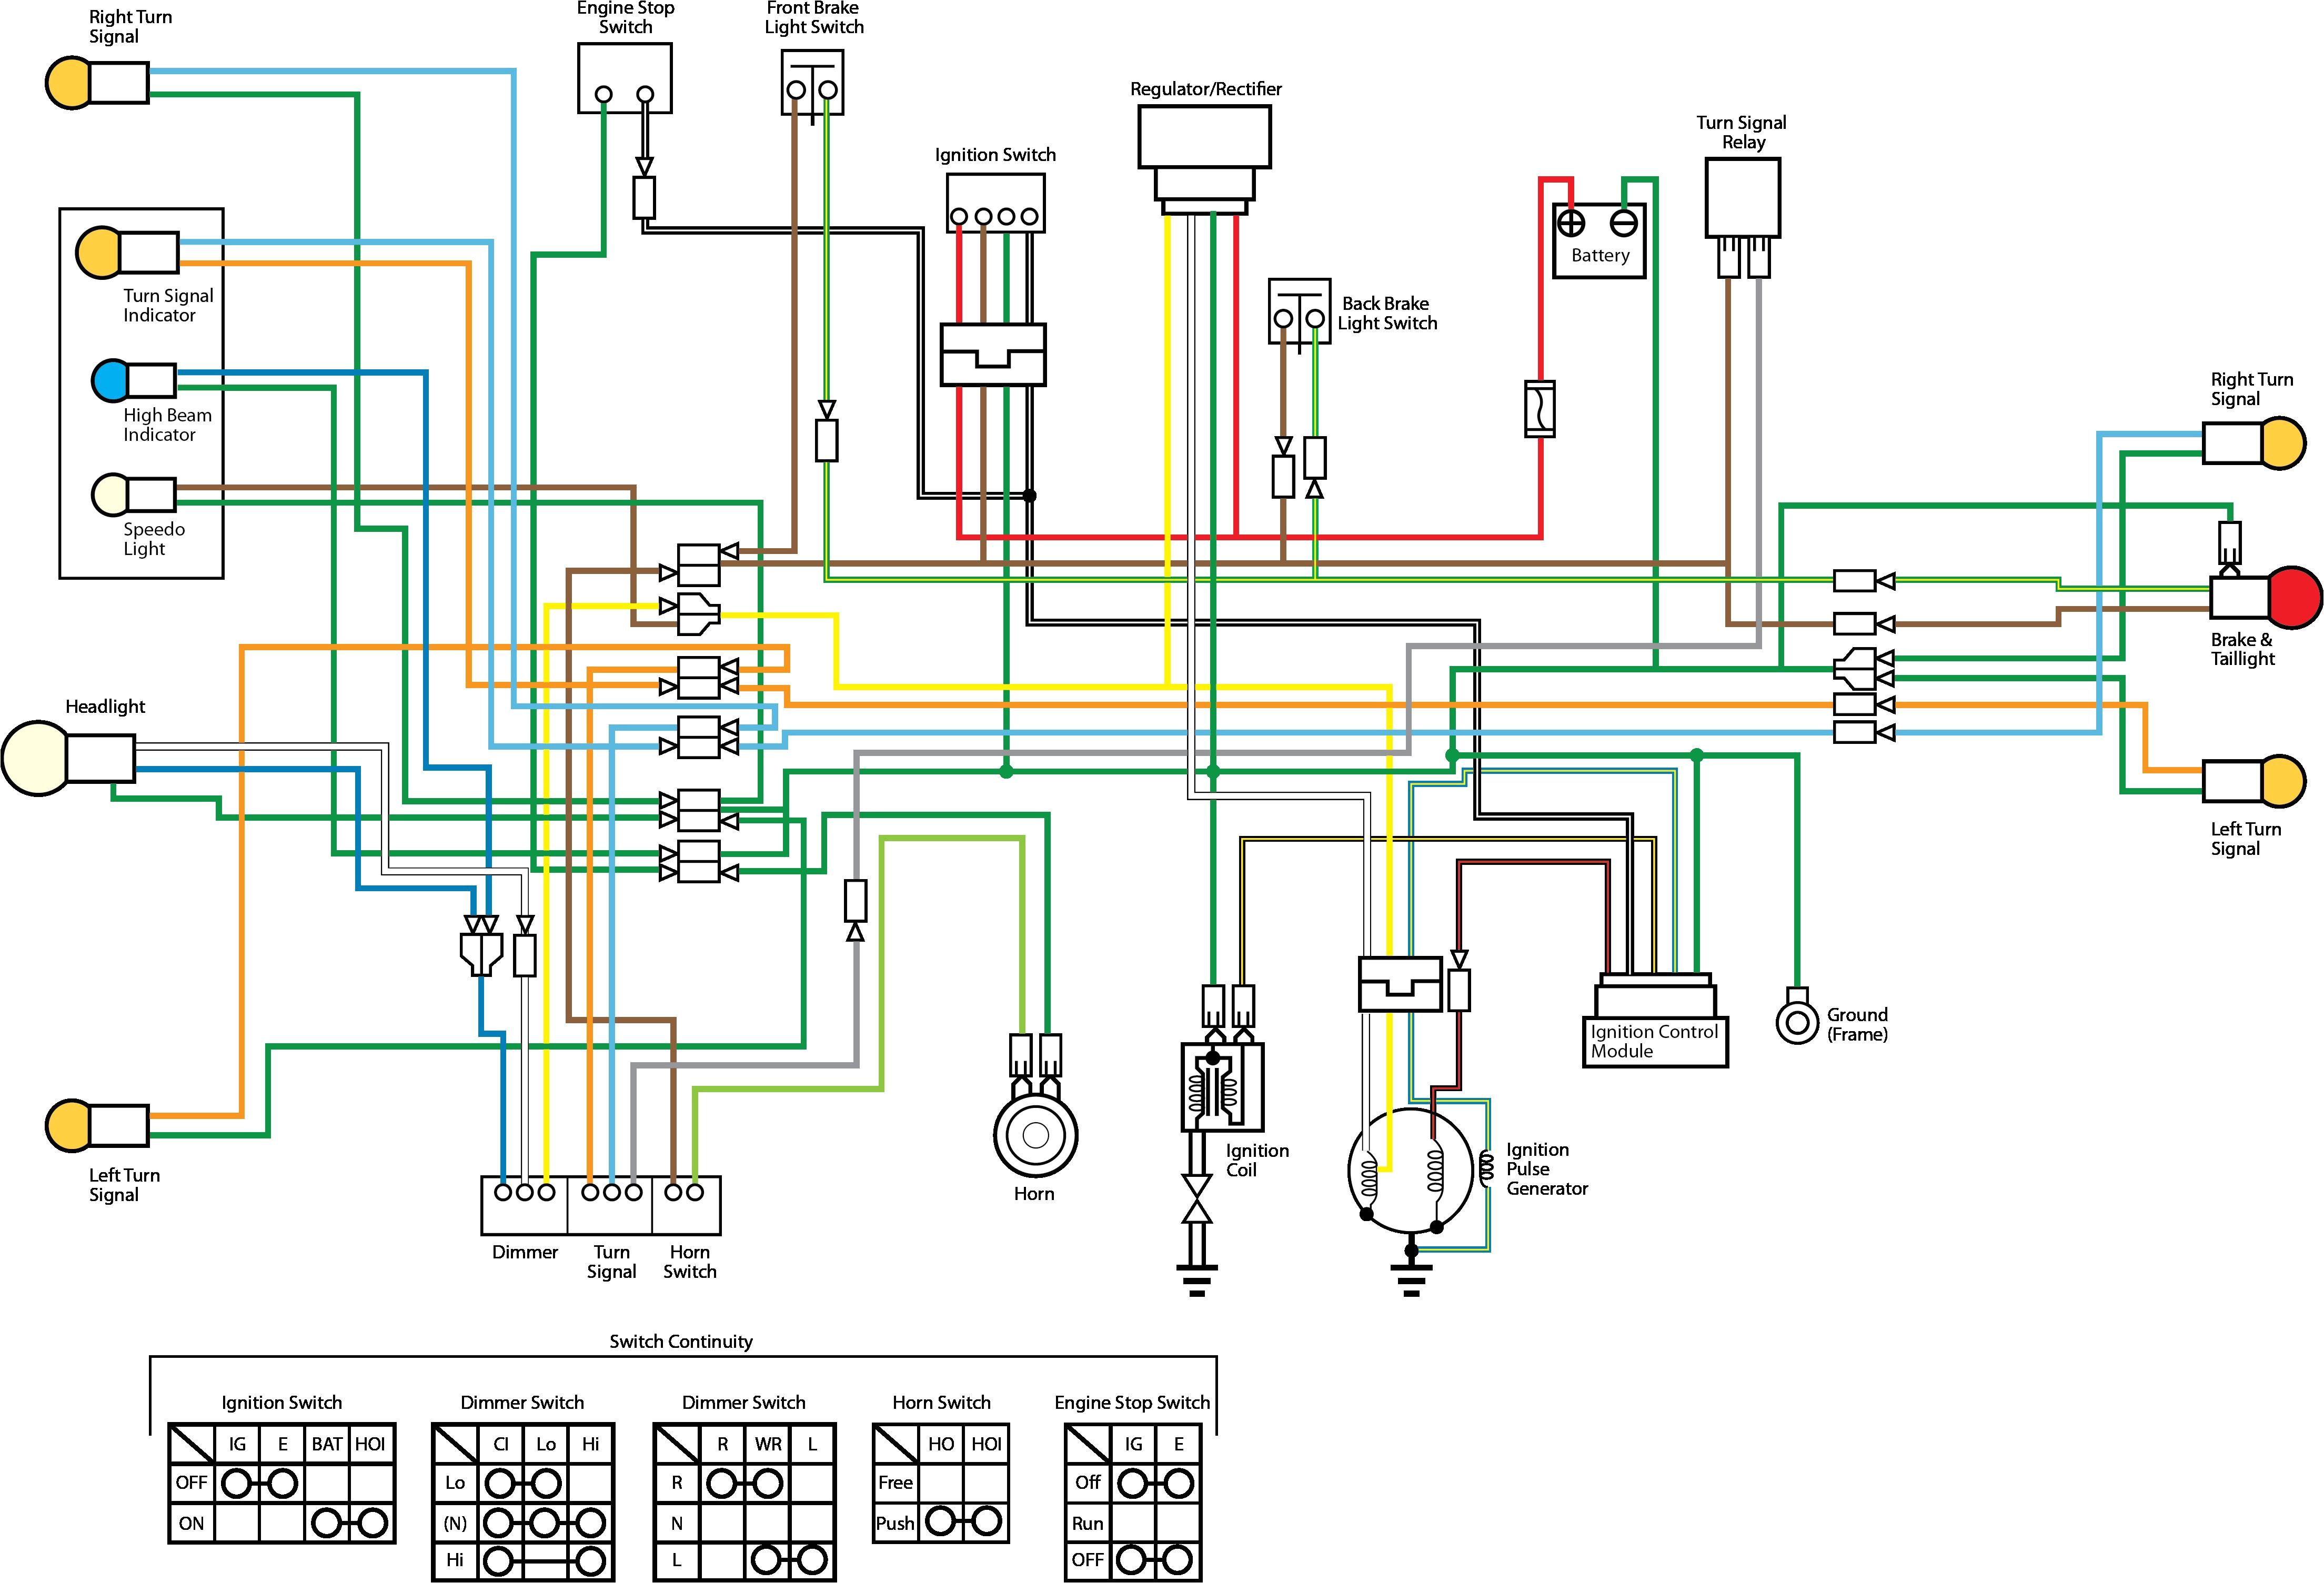 schematic wiring diagram ach 800 wiring diagram centre front light wiring harness diagram19kb